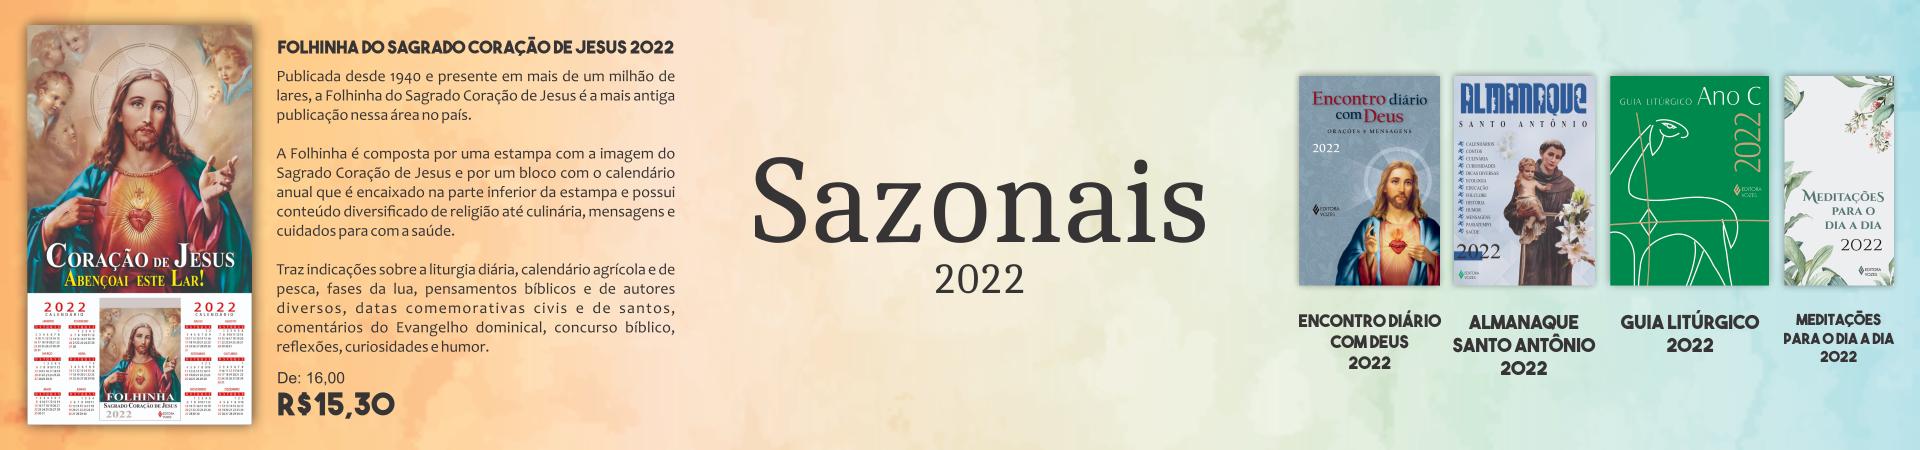 Sazonais